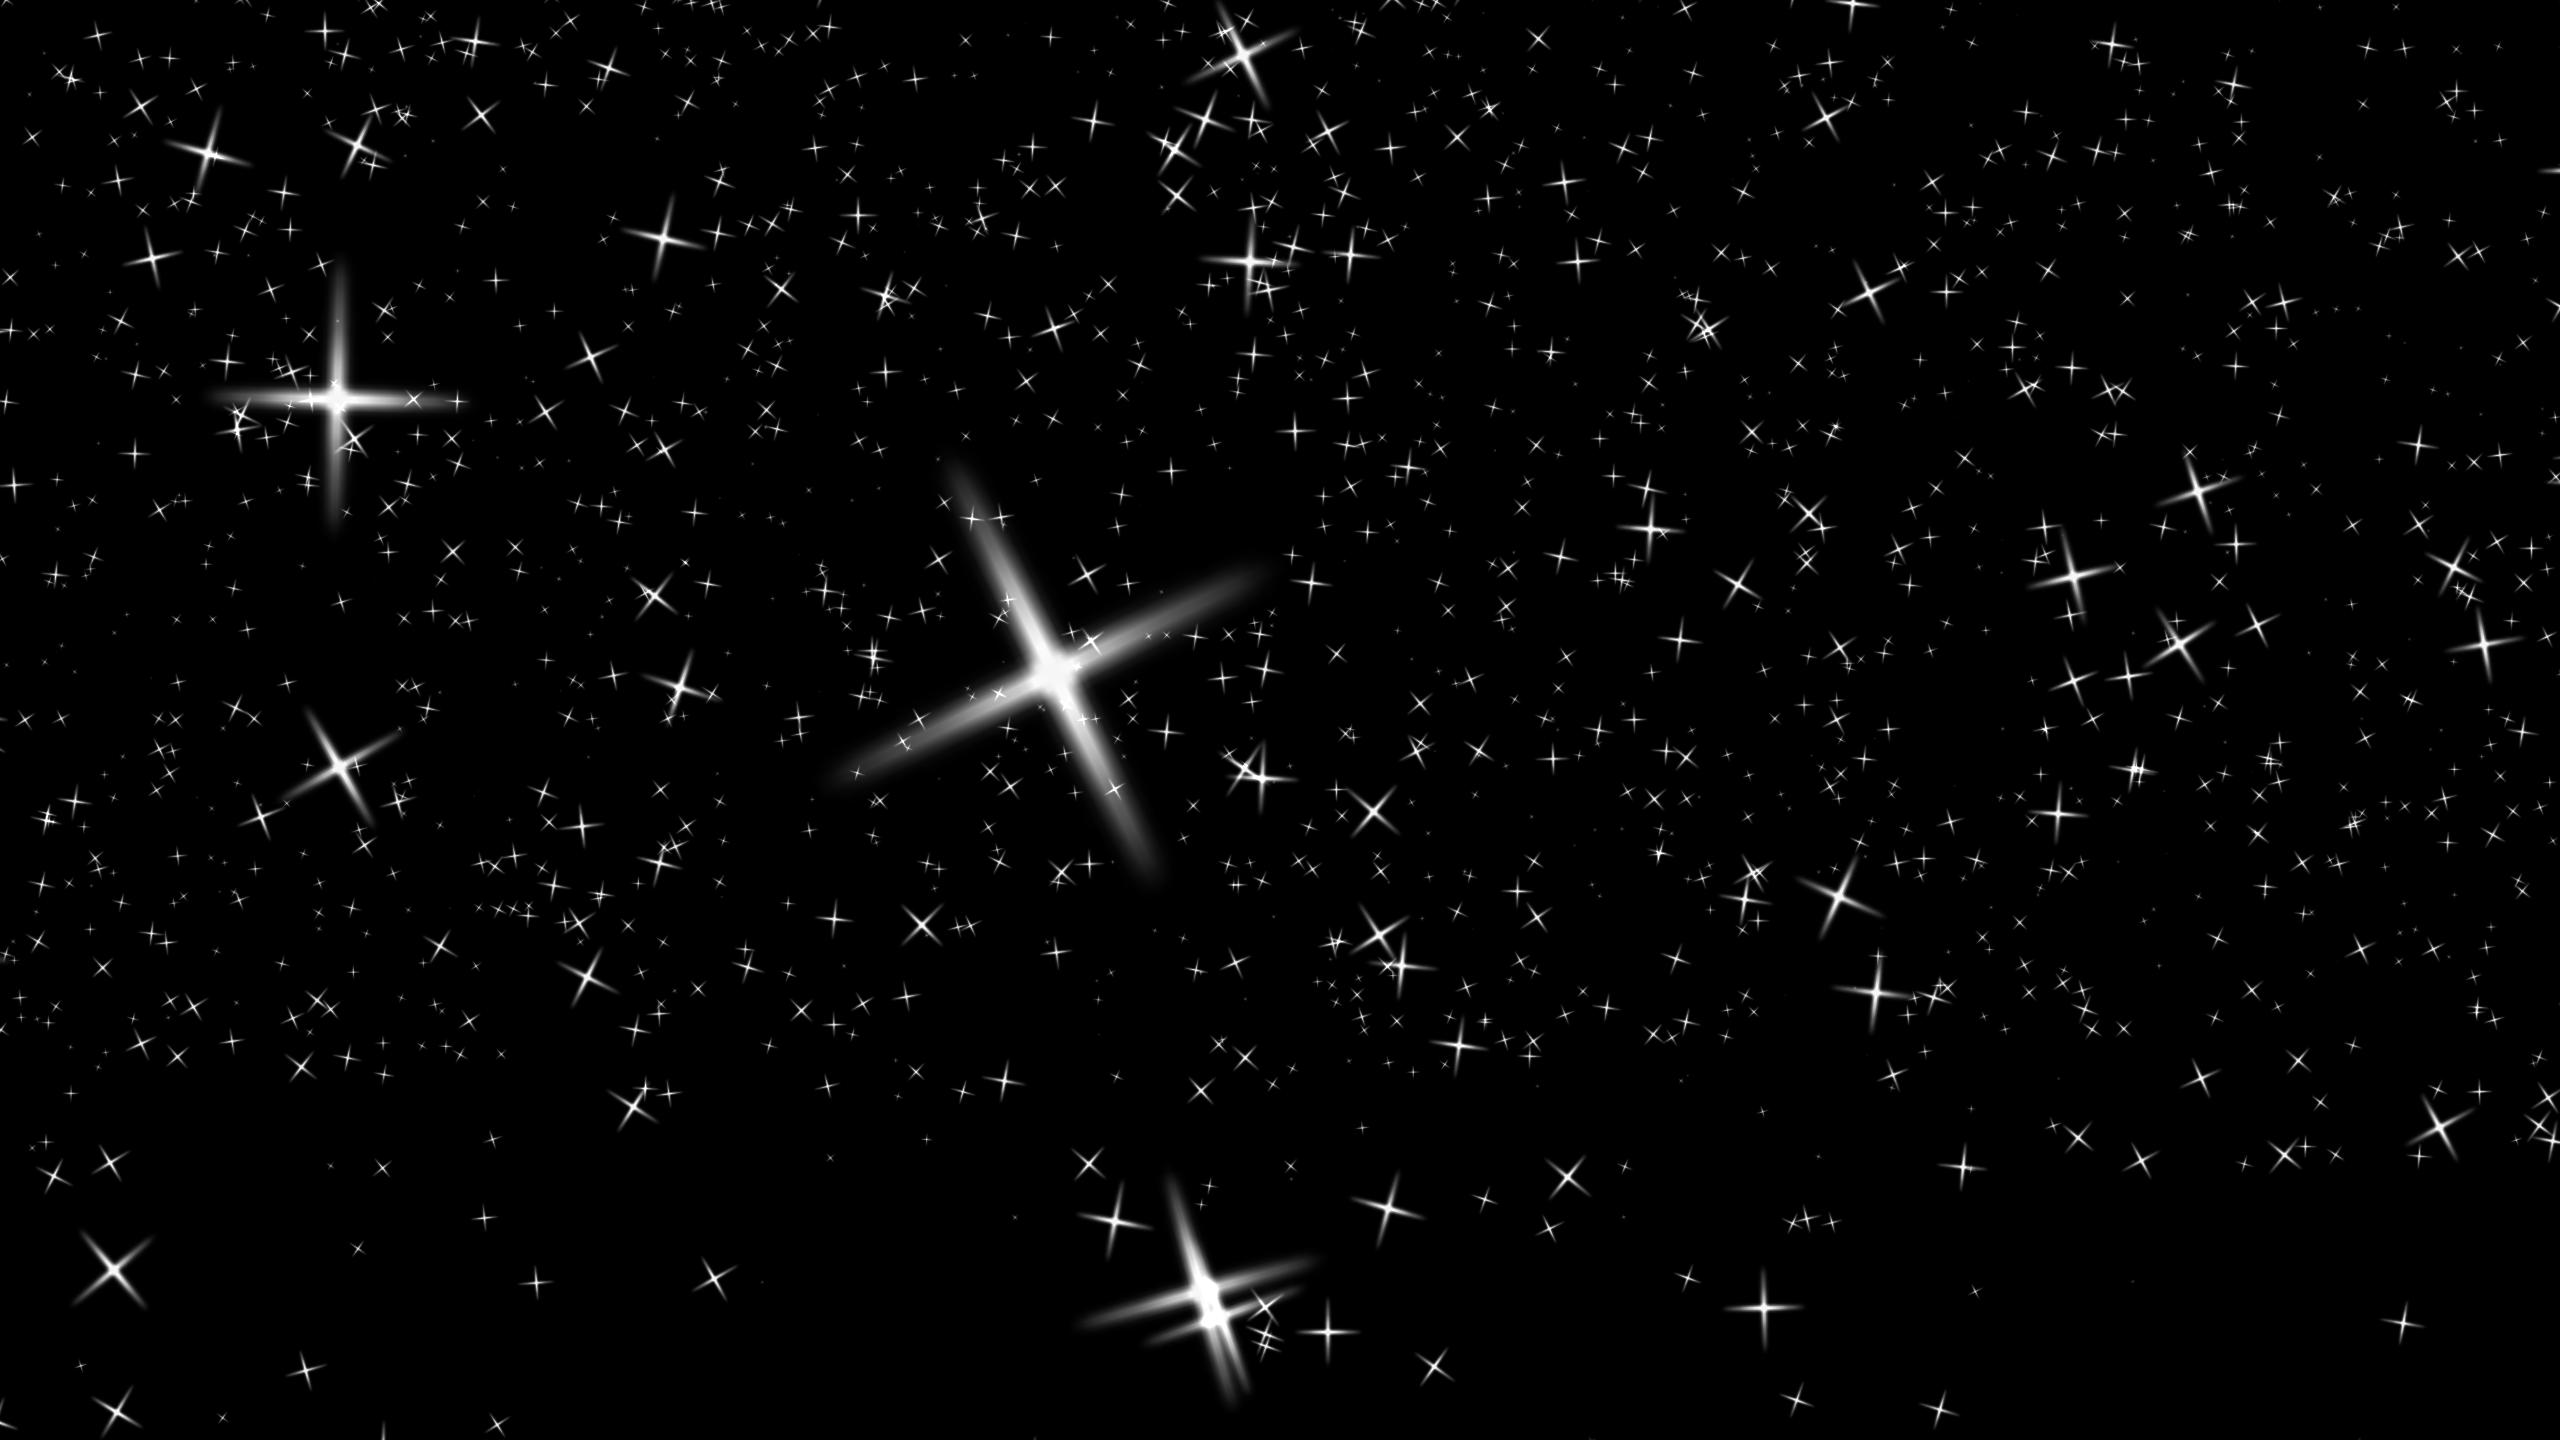 MMD KiraKiraSparkle Effect   DL By ChestNutScoop MMD KiraKiraSparkle Effect    DL By ChestNutScoop - Sparkle PNG HD